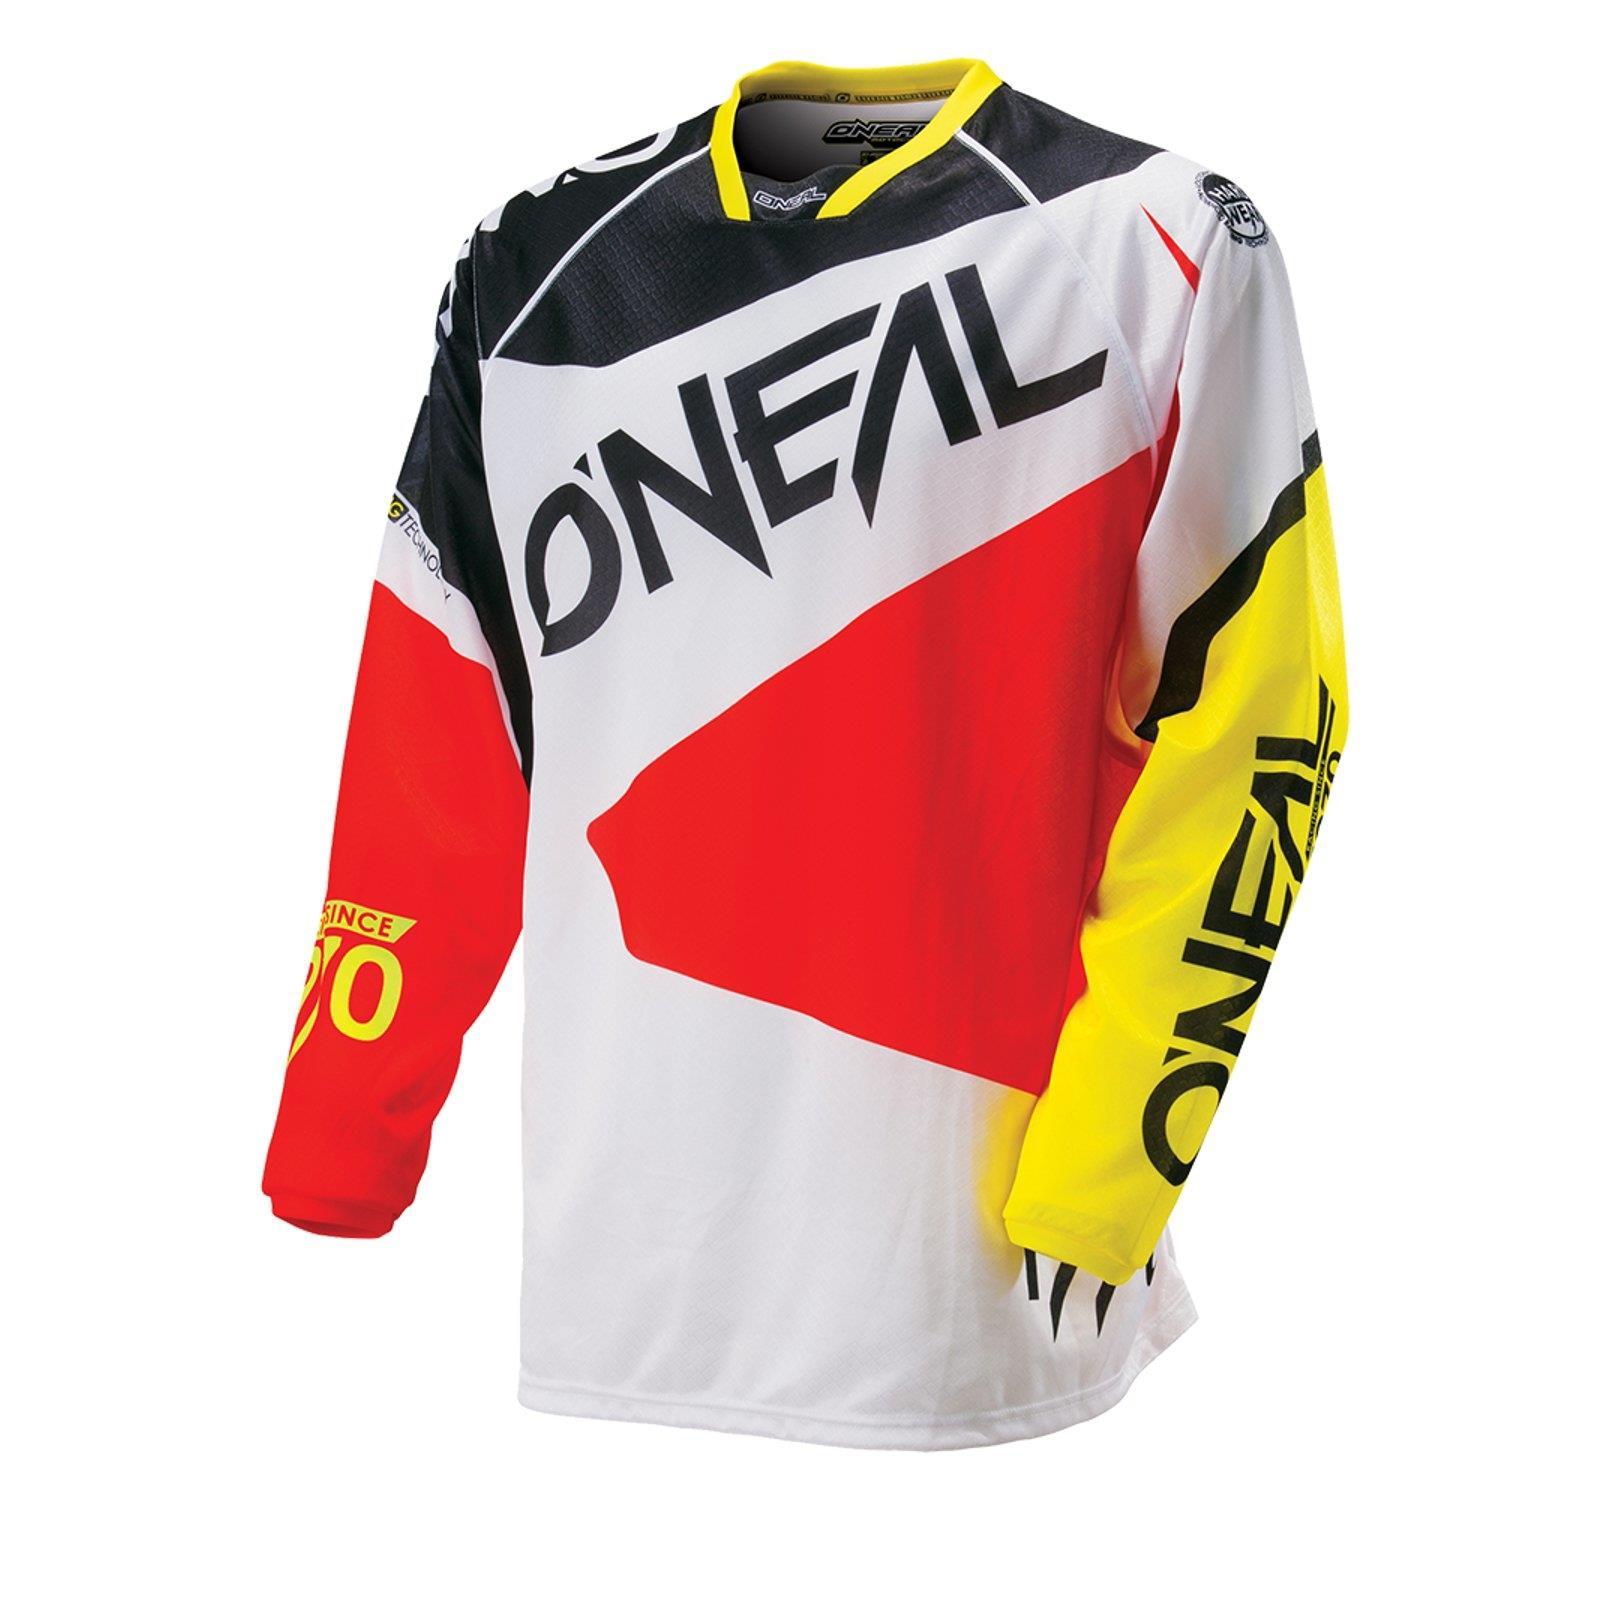 ONEAL-Hardwear-MX-Jersey-FLOW-BIANCO-SHIRT-SUPER-MOTO-CROSS-ENDURO-MOTO-MTB-FR miniatura 3